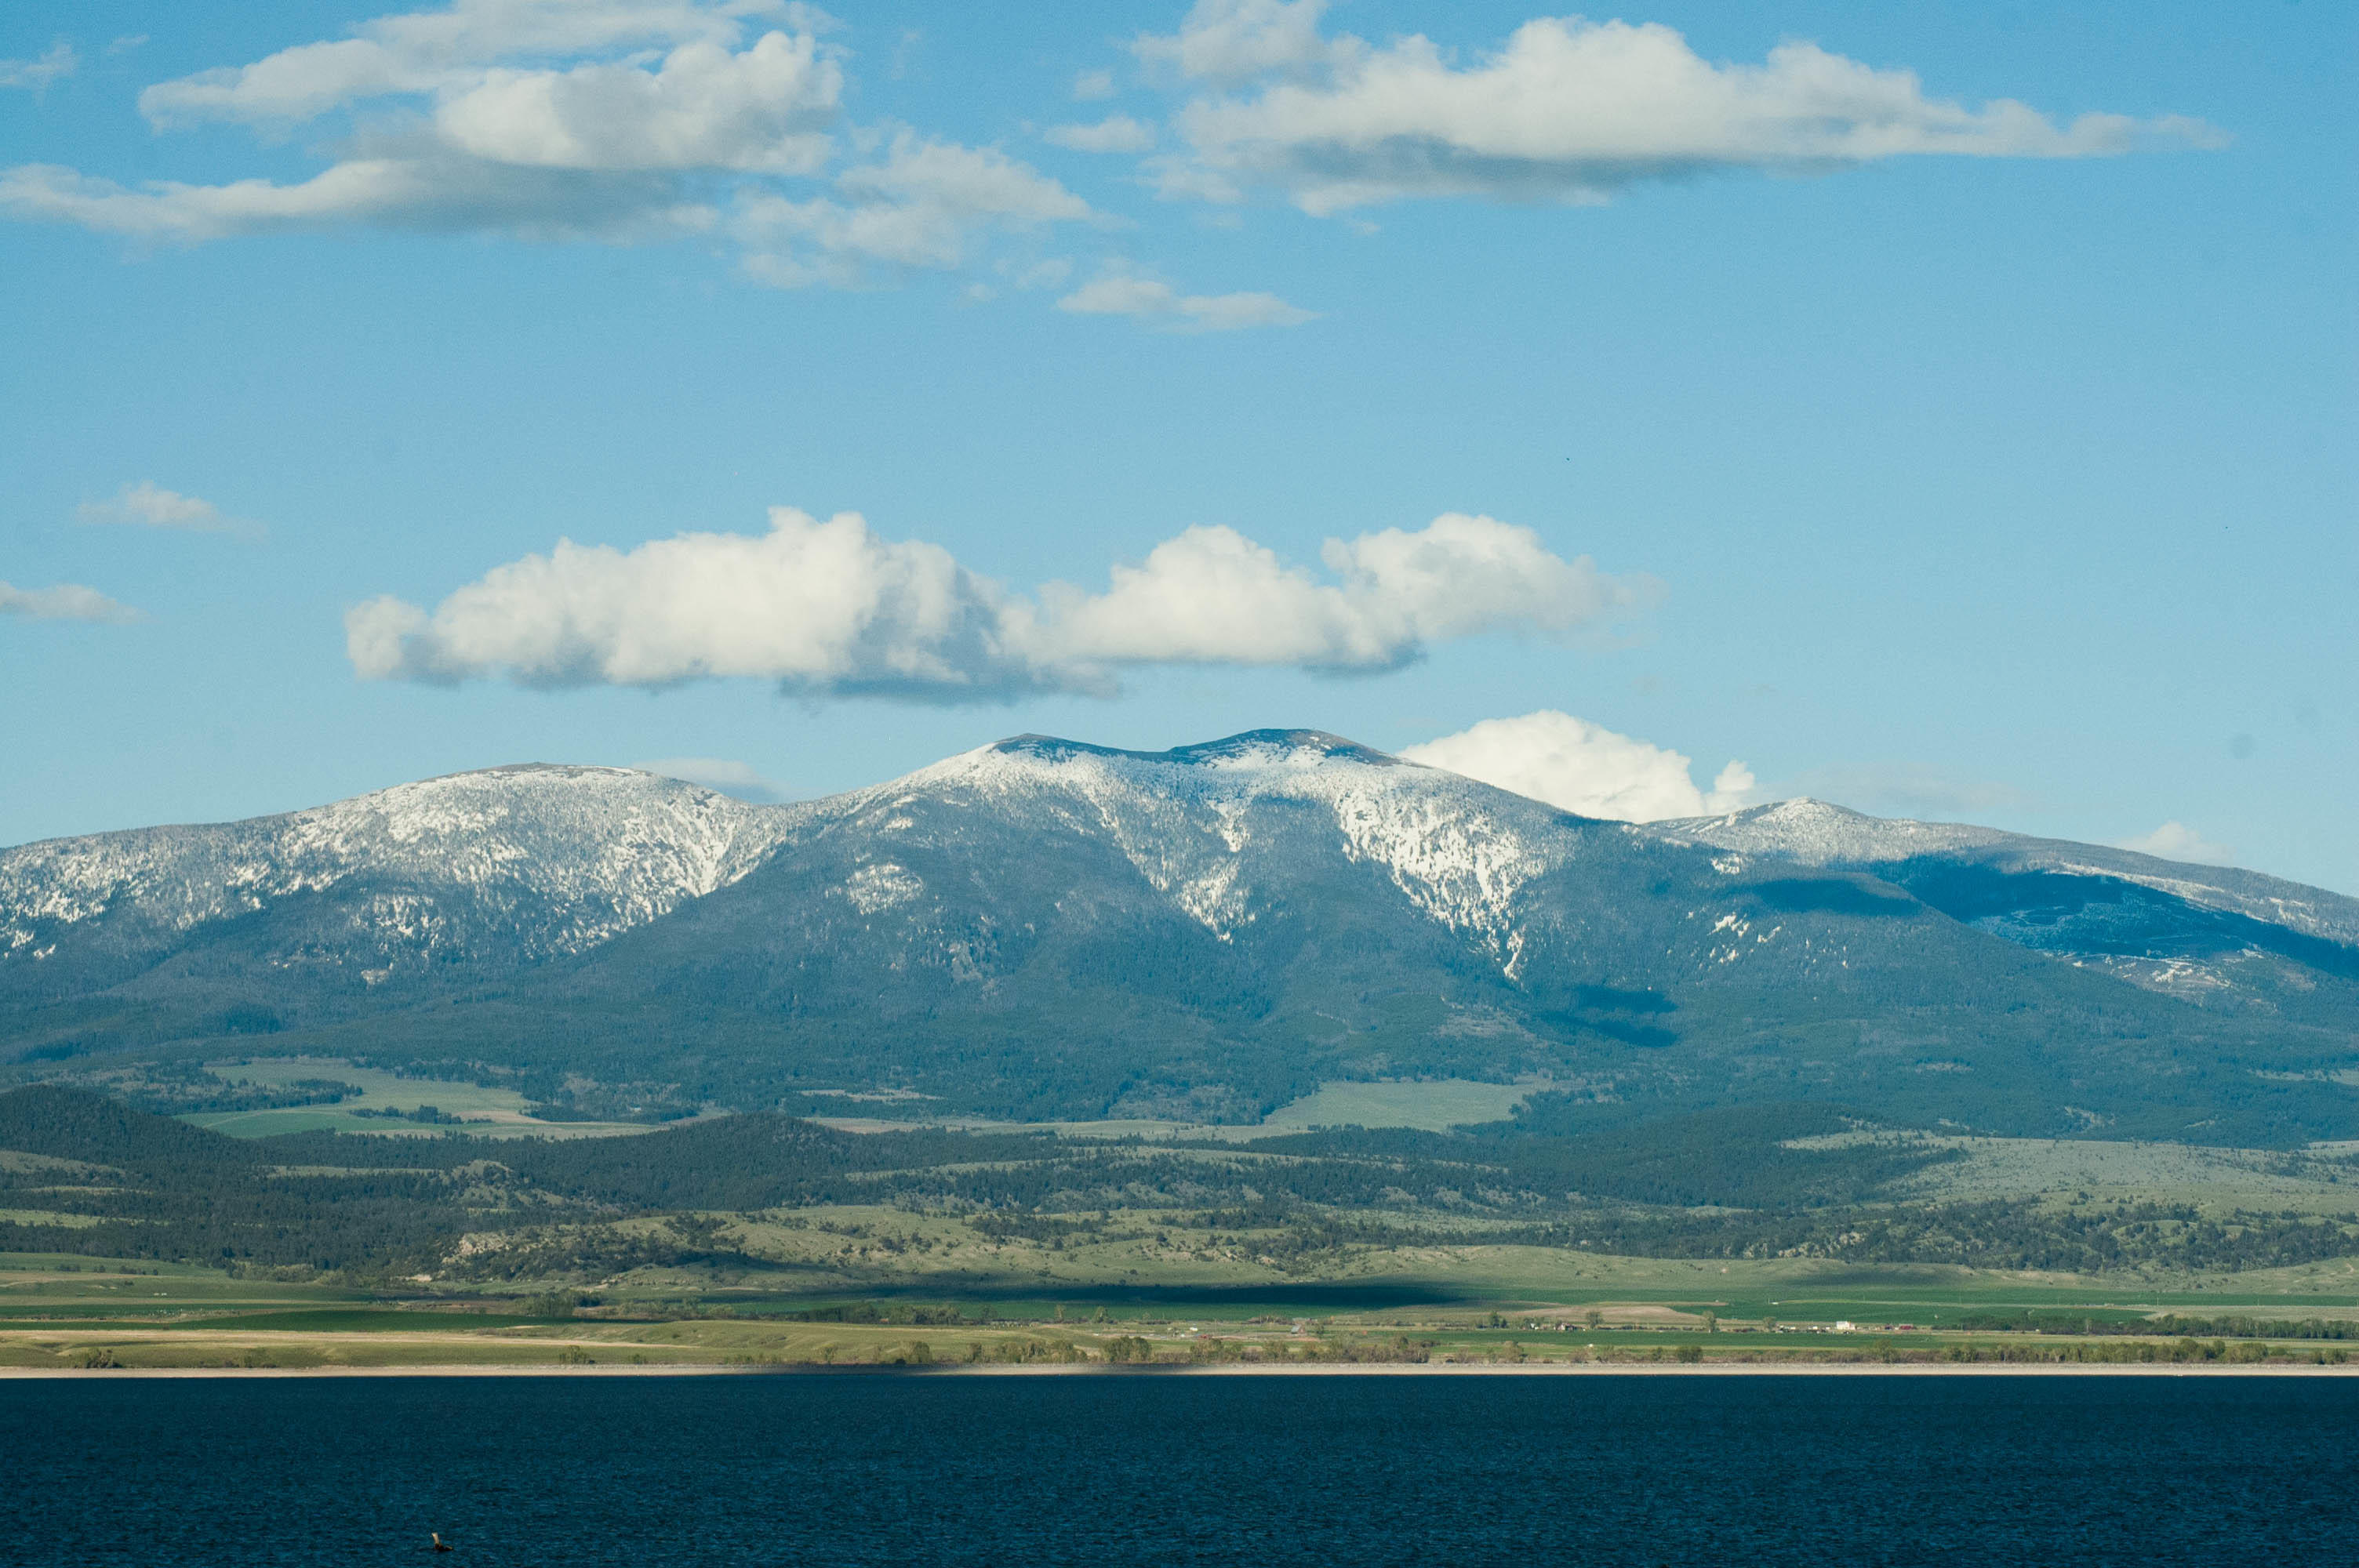 Townsend / Canyon Ferry Lake KOA Journey image 7